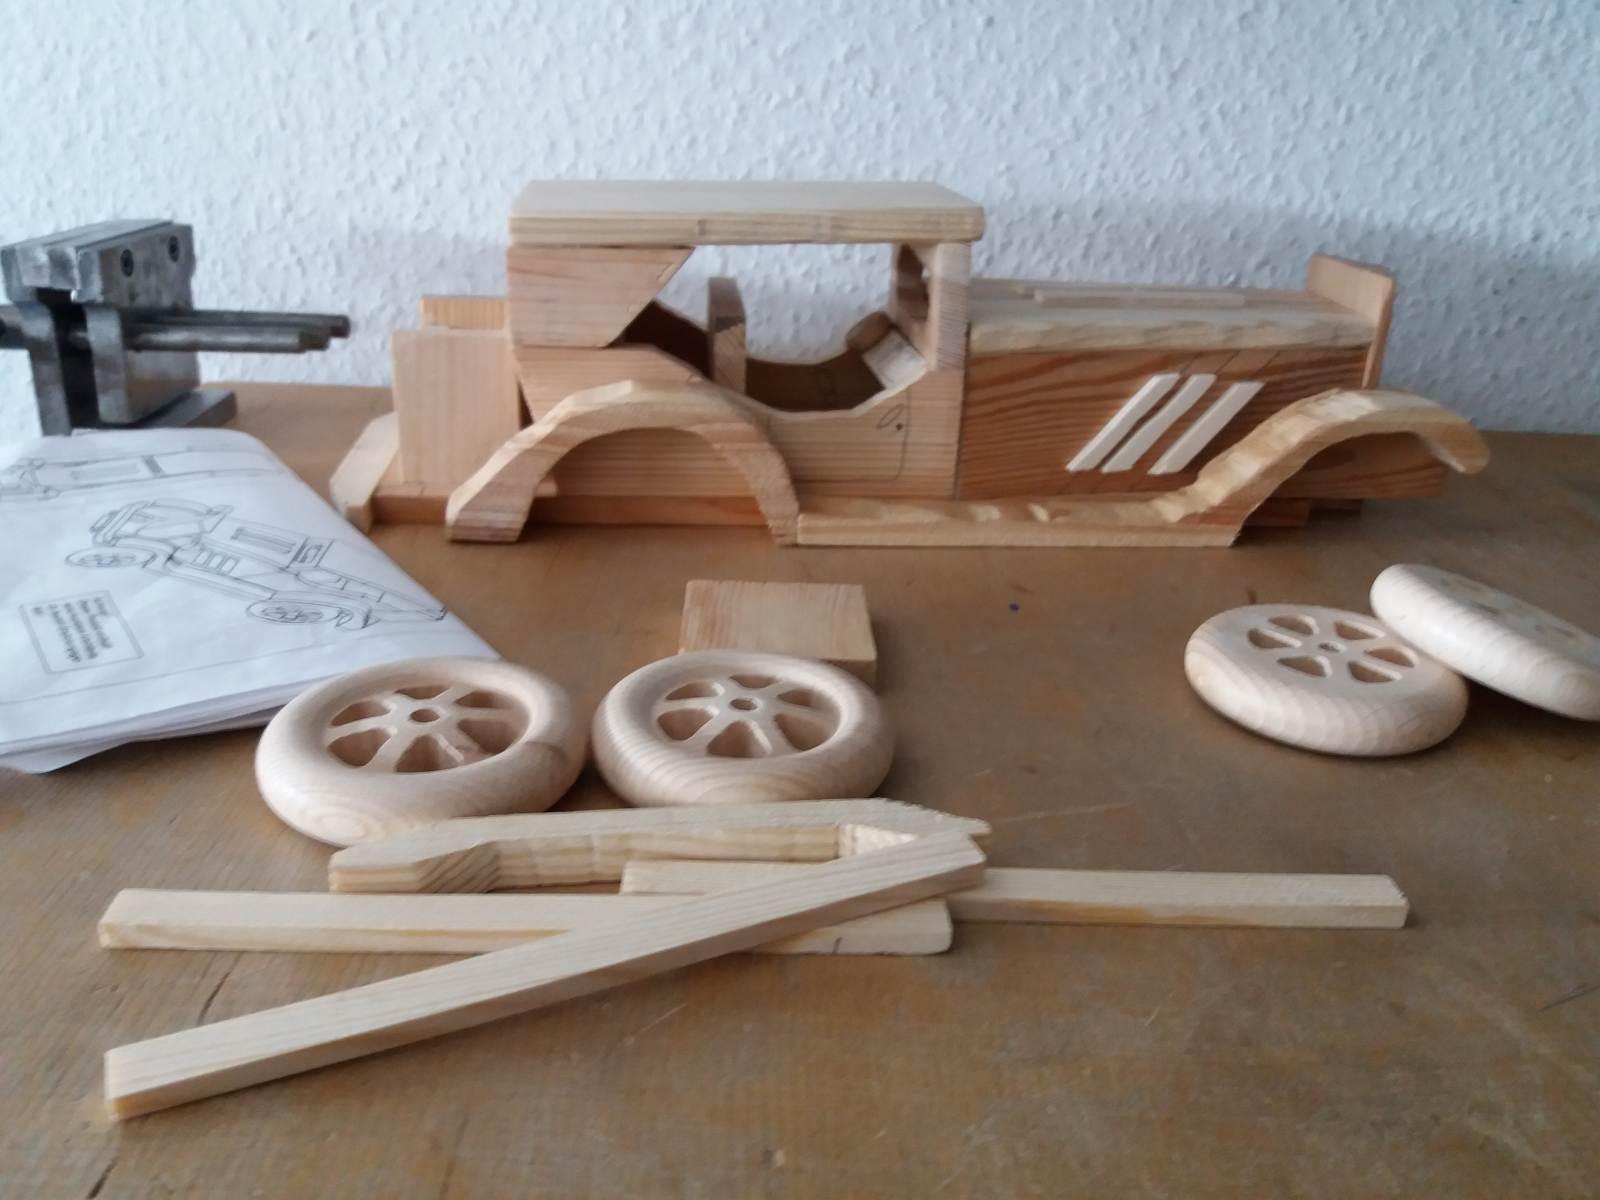 Praxisgemeinschaft-Impulse Rastatt Praxisraum Ergotherapie: Holzarbeit Auto